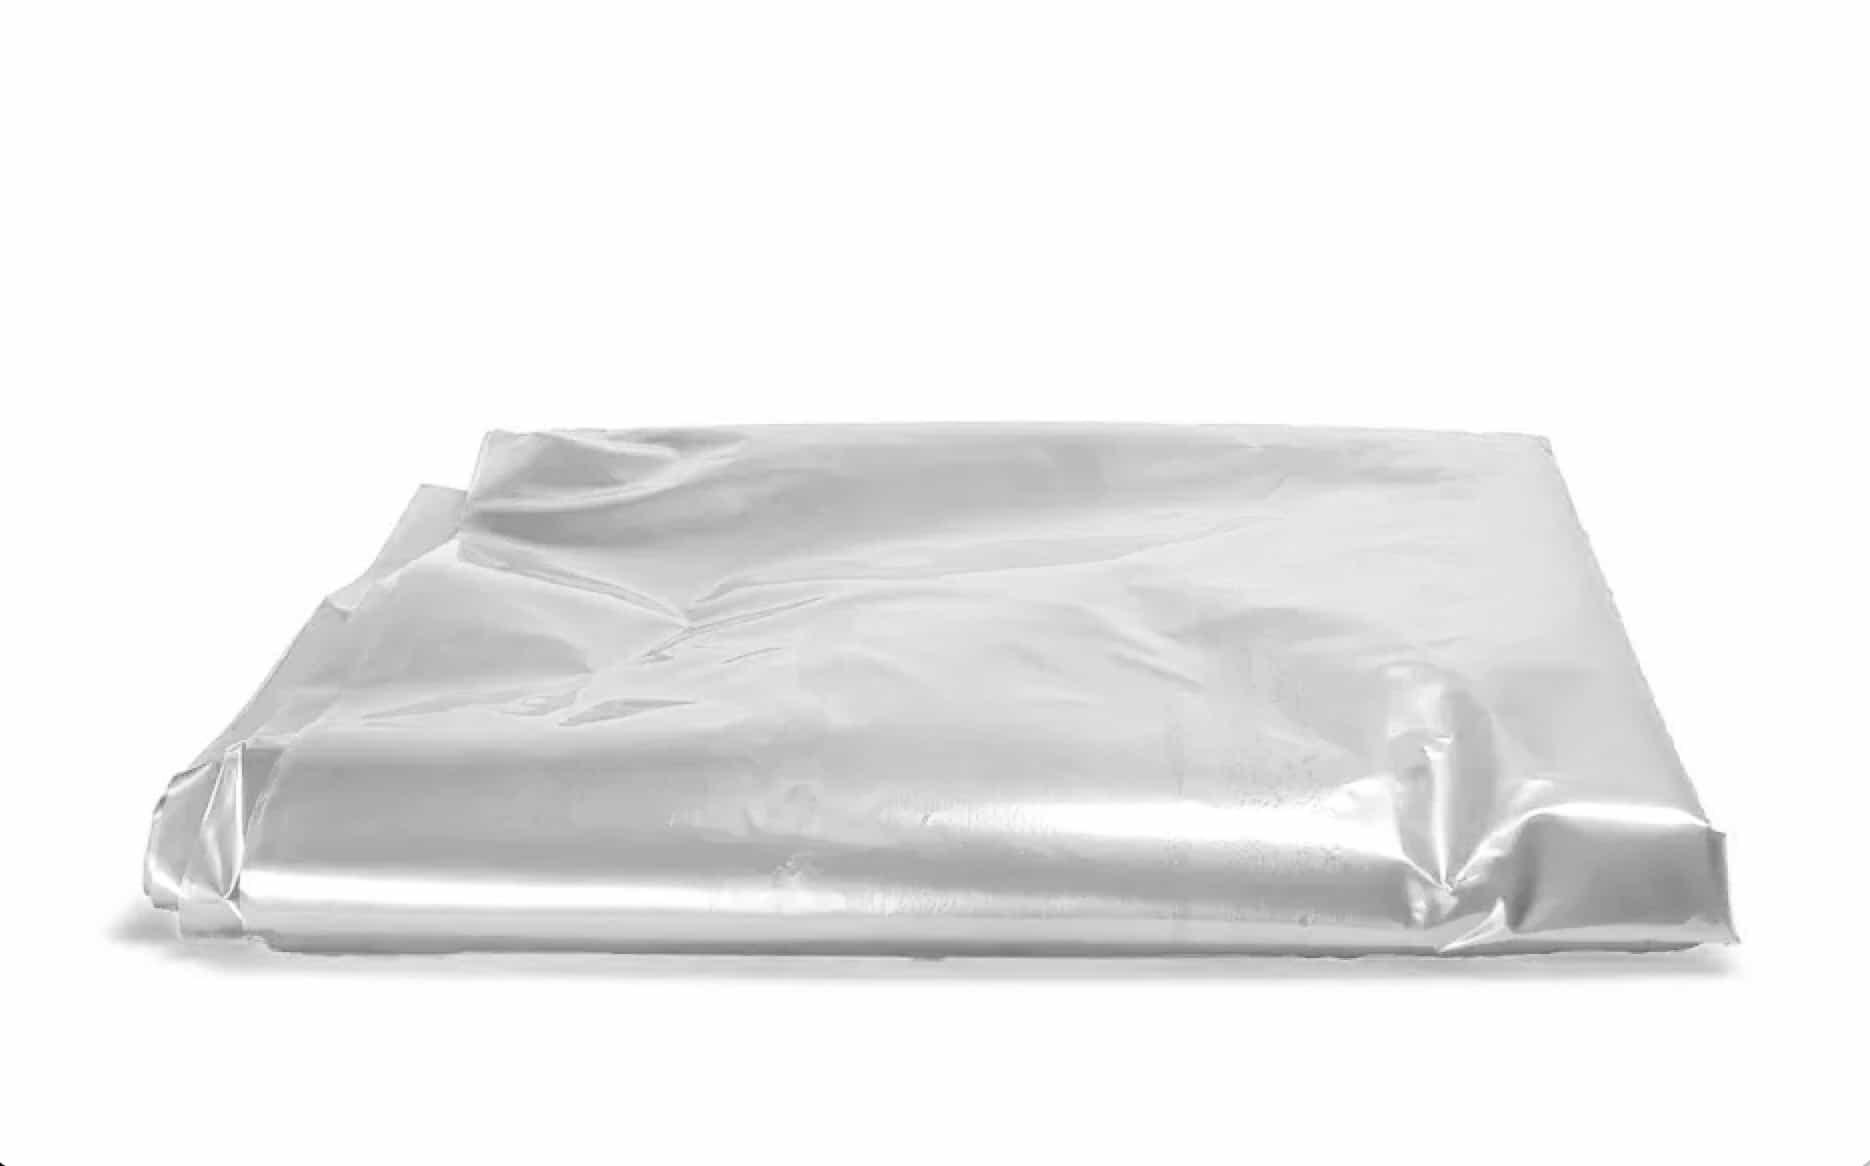 Plastic matrashoes transparant 2 persoons - 2300 x 2200 x 220mm